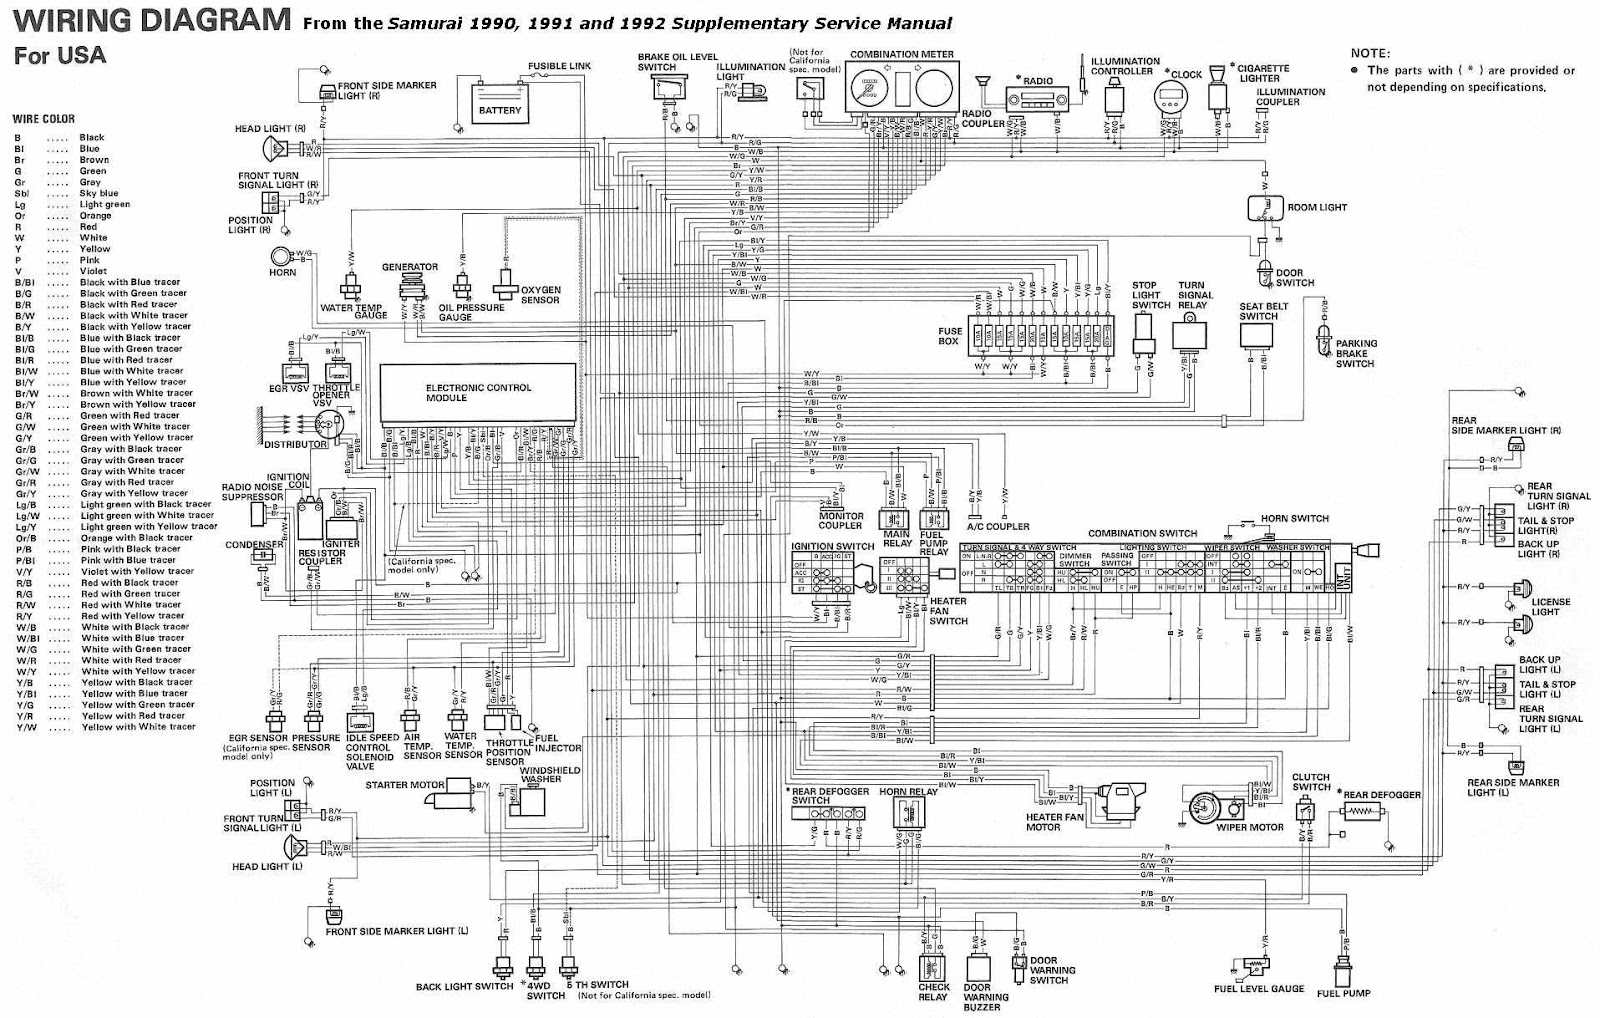 Suzuki Samurai 19901992 Complete Electrical Wiring